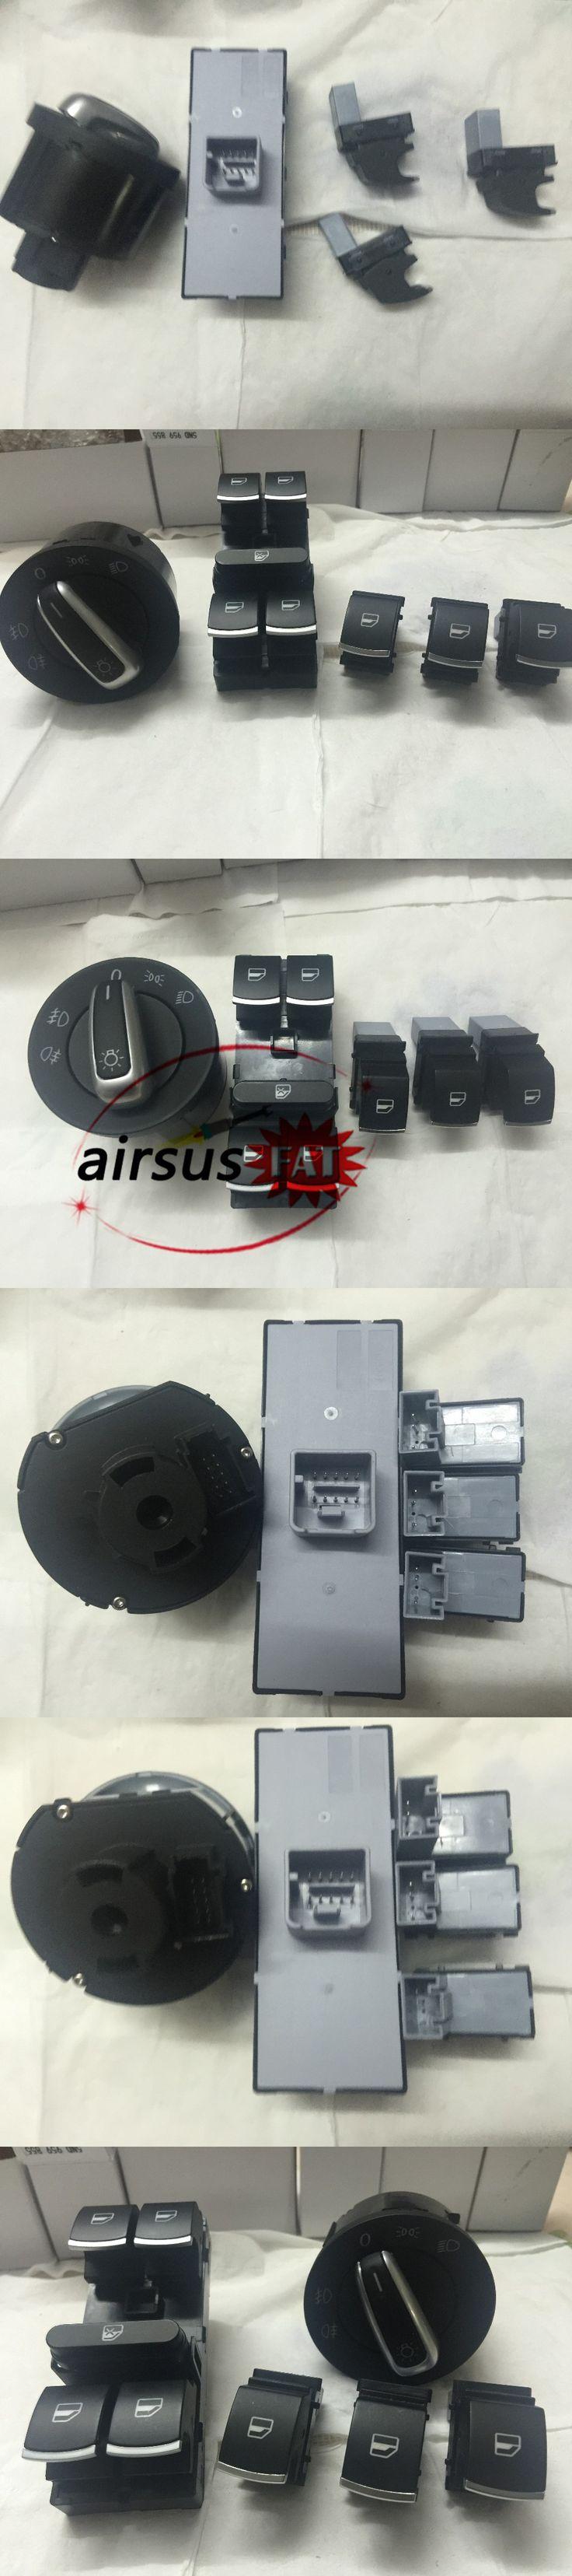 FAT ship chrome auto headlight switch+ master & single window switch for volkswagen vw cc tiguan passat b6 golf 5 6 jetta mk5